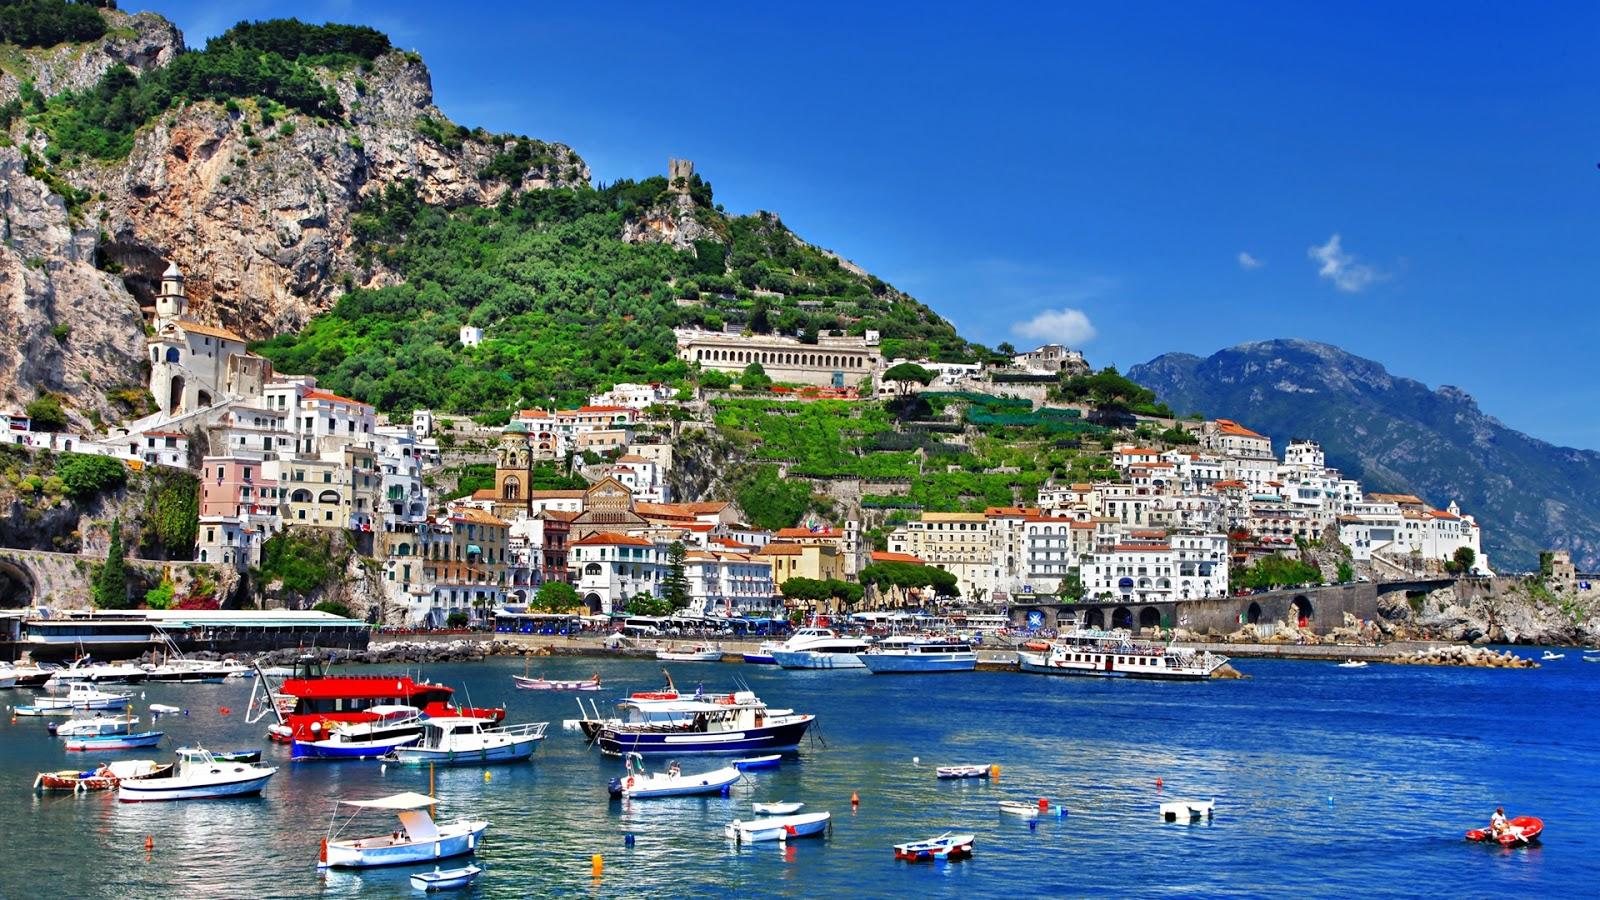 Italy Salerno Full HD Desktop Wallpapers 1080p 1600x900